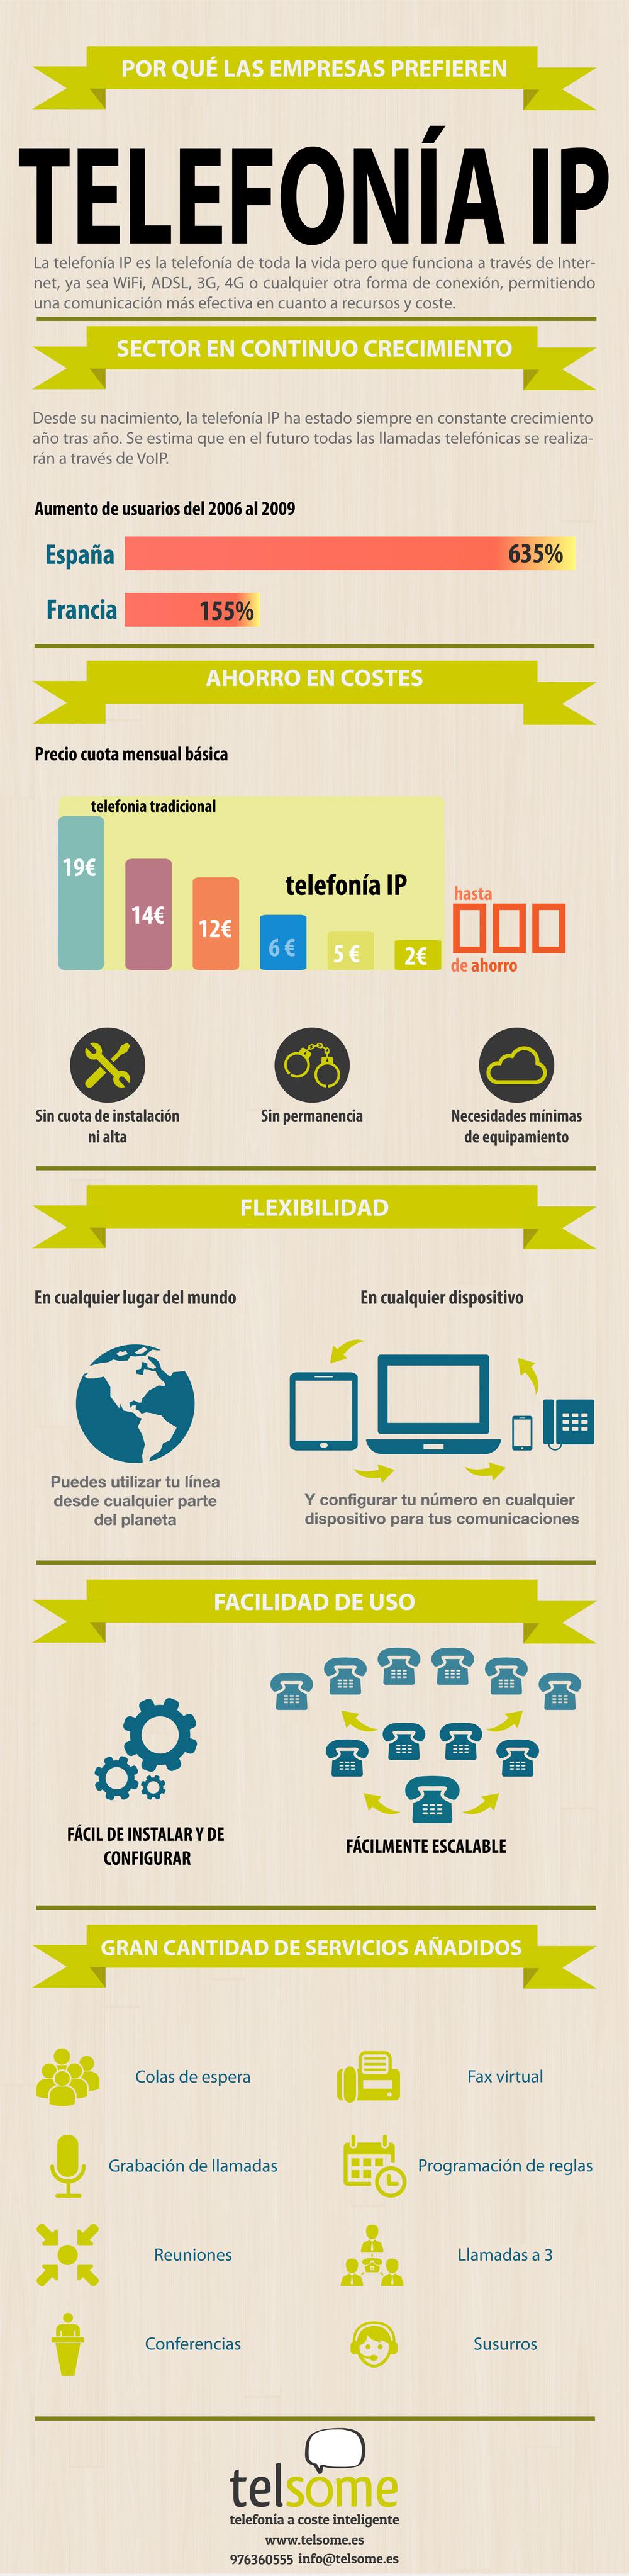 telefonia ip empresas: ventajas de la voip - Telsome